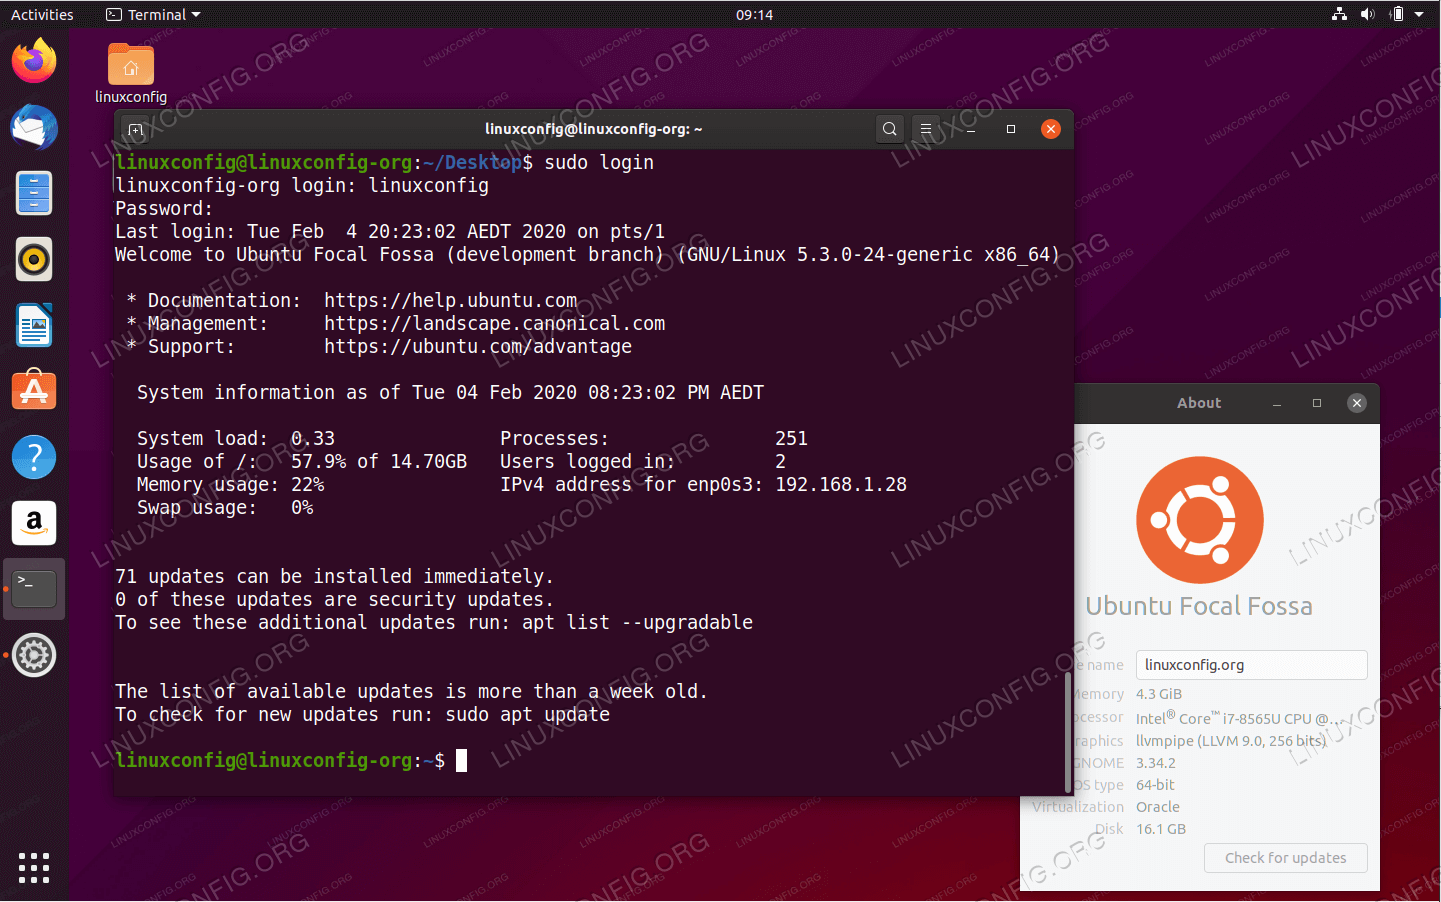 dynamic motd and news on Ubuntu 20.04 Focal Fossa Linux